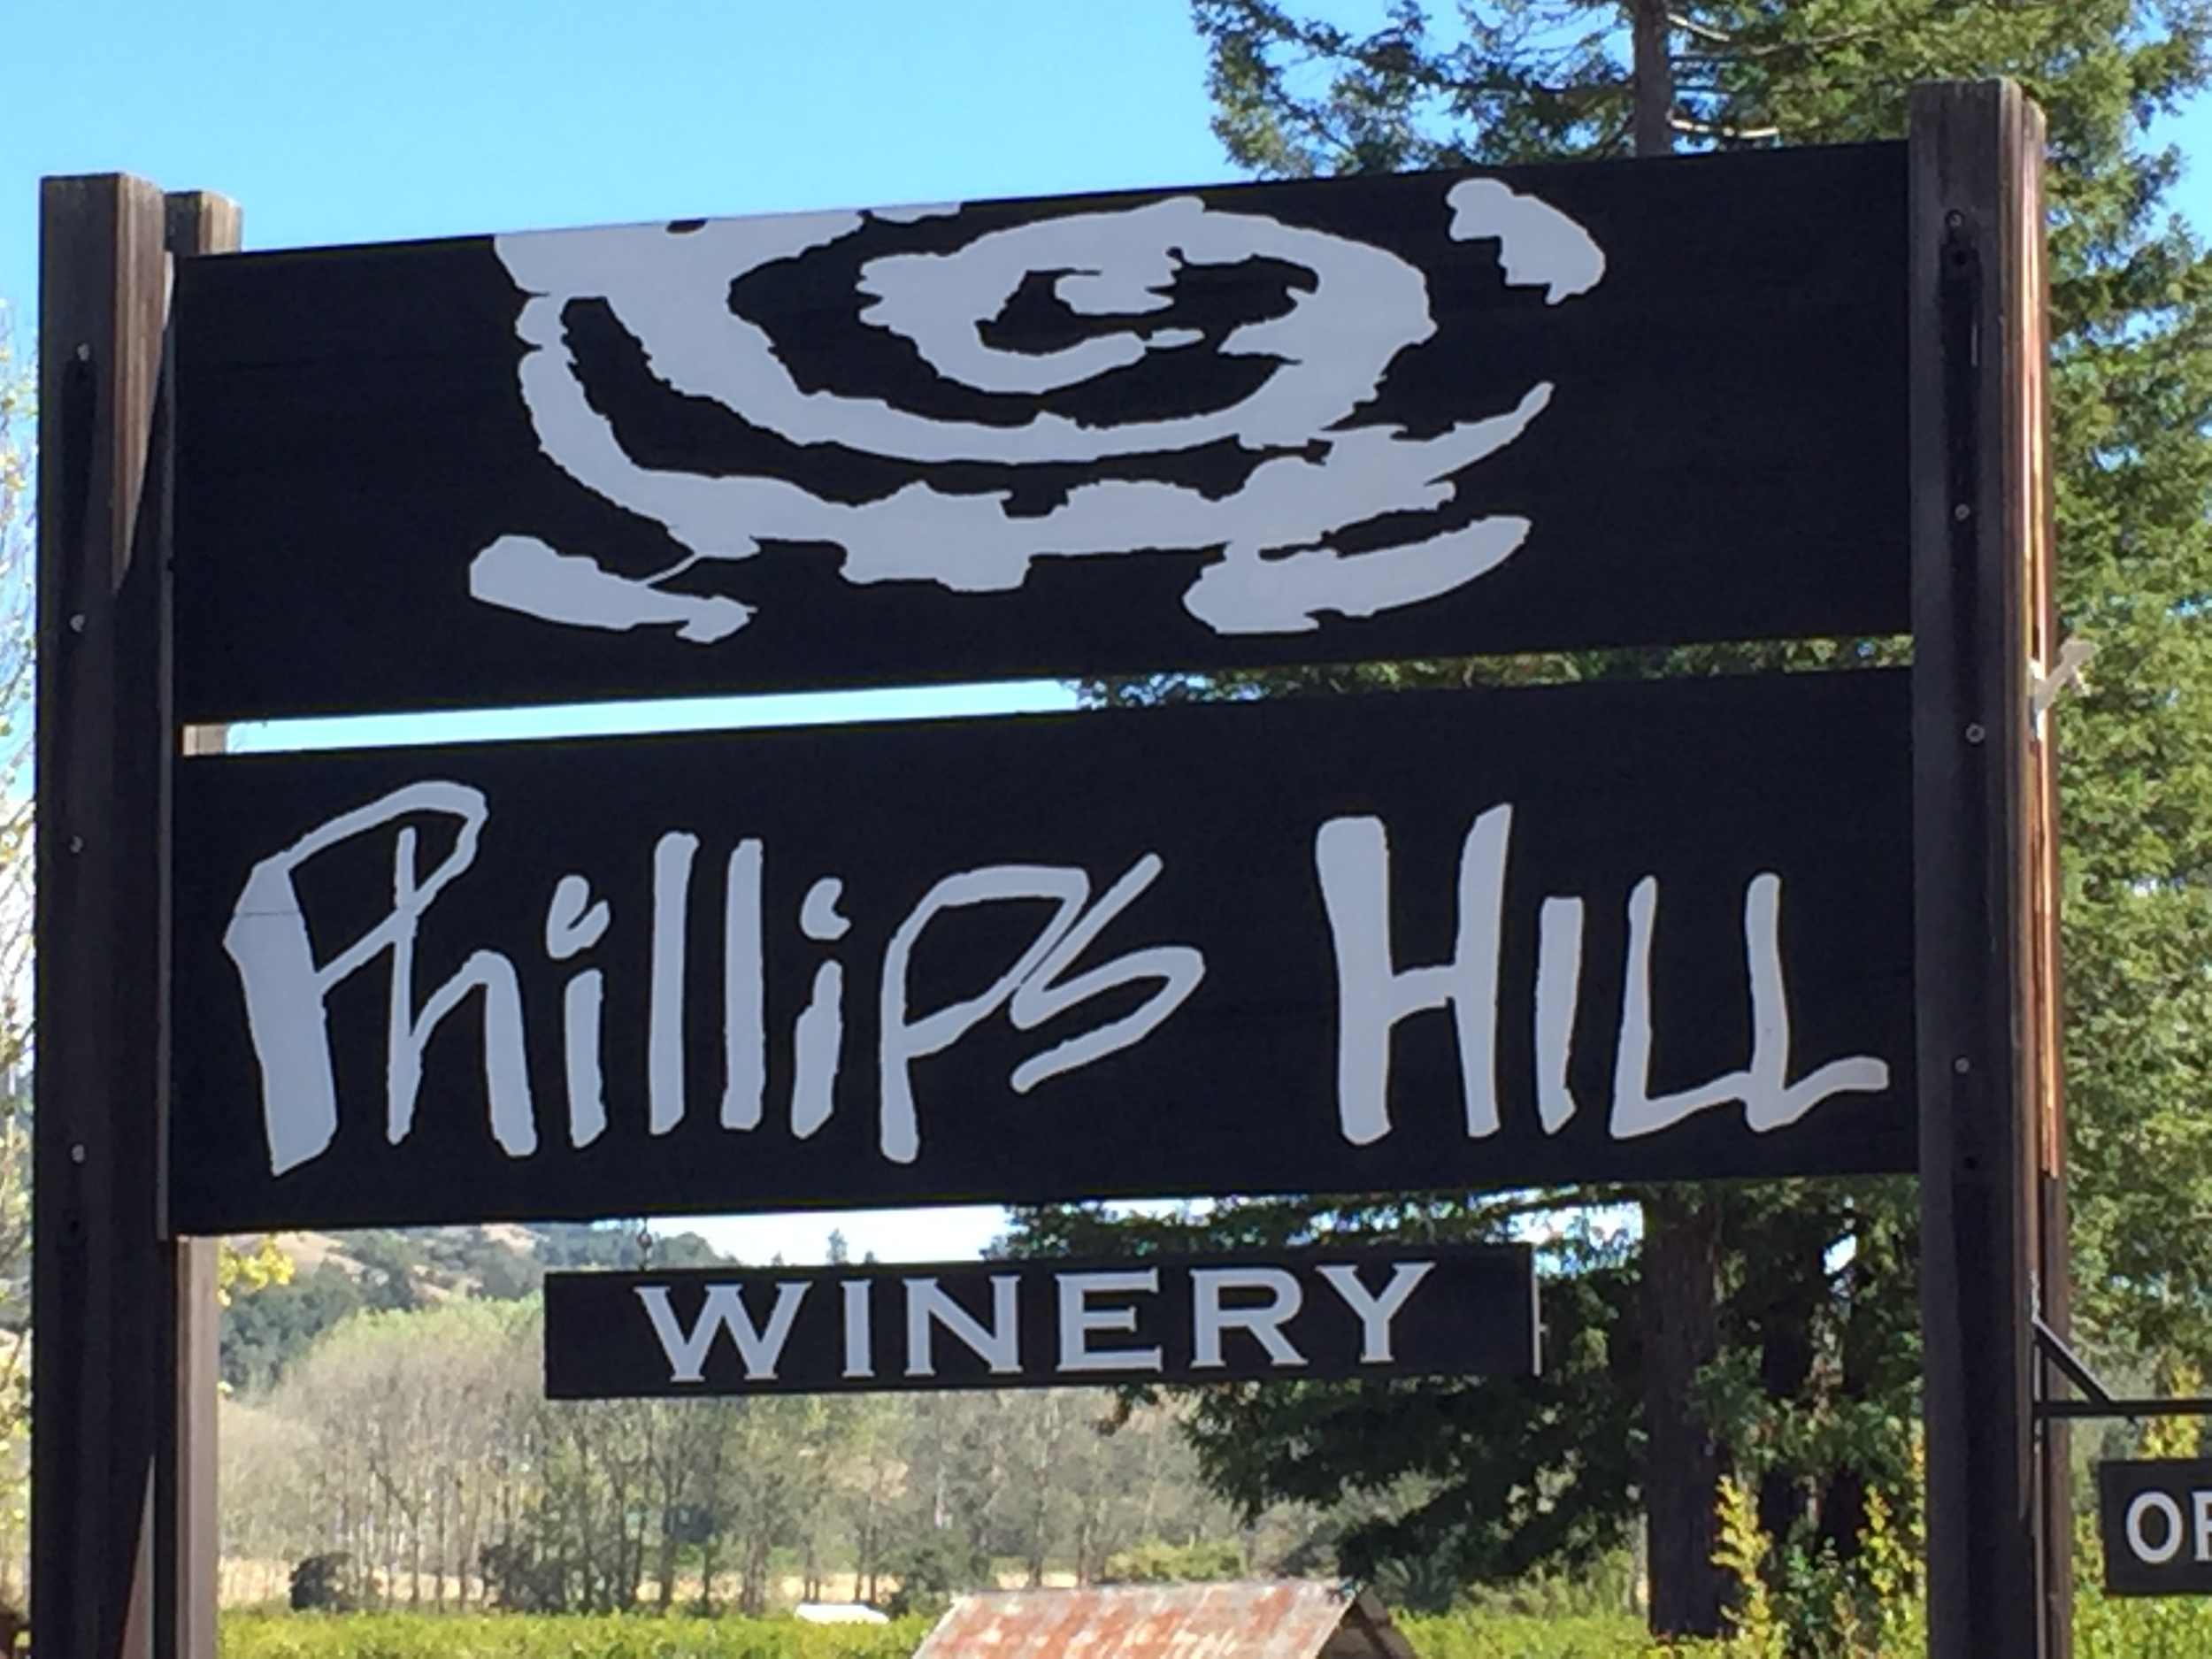 Phillips Hill